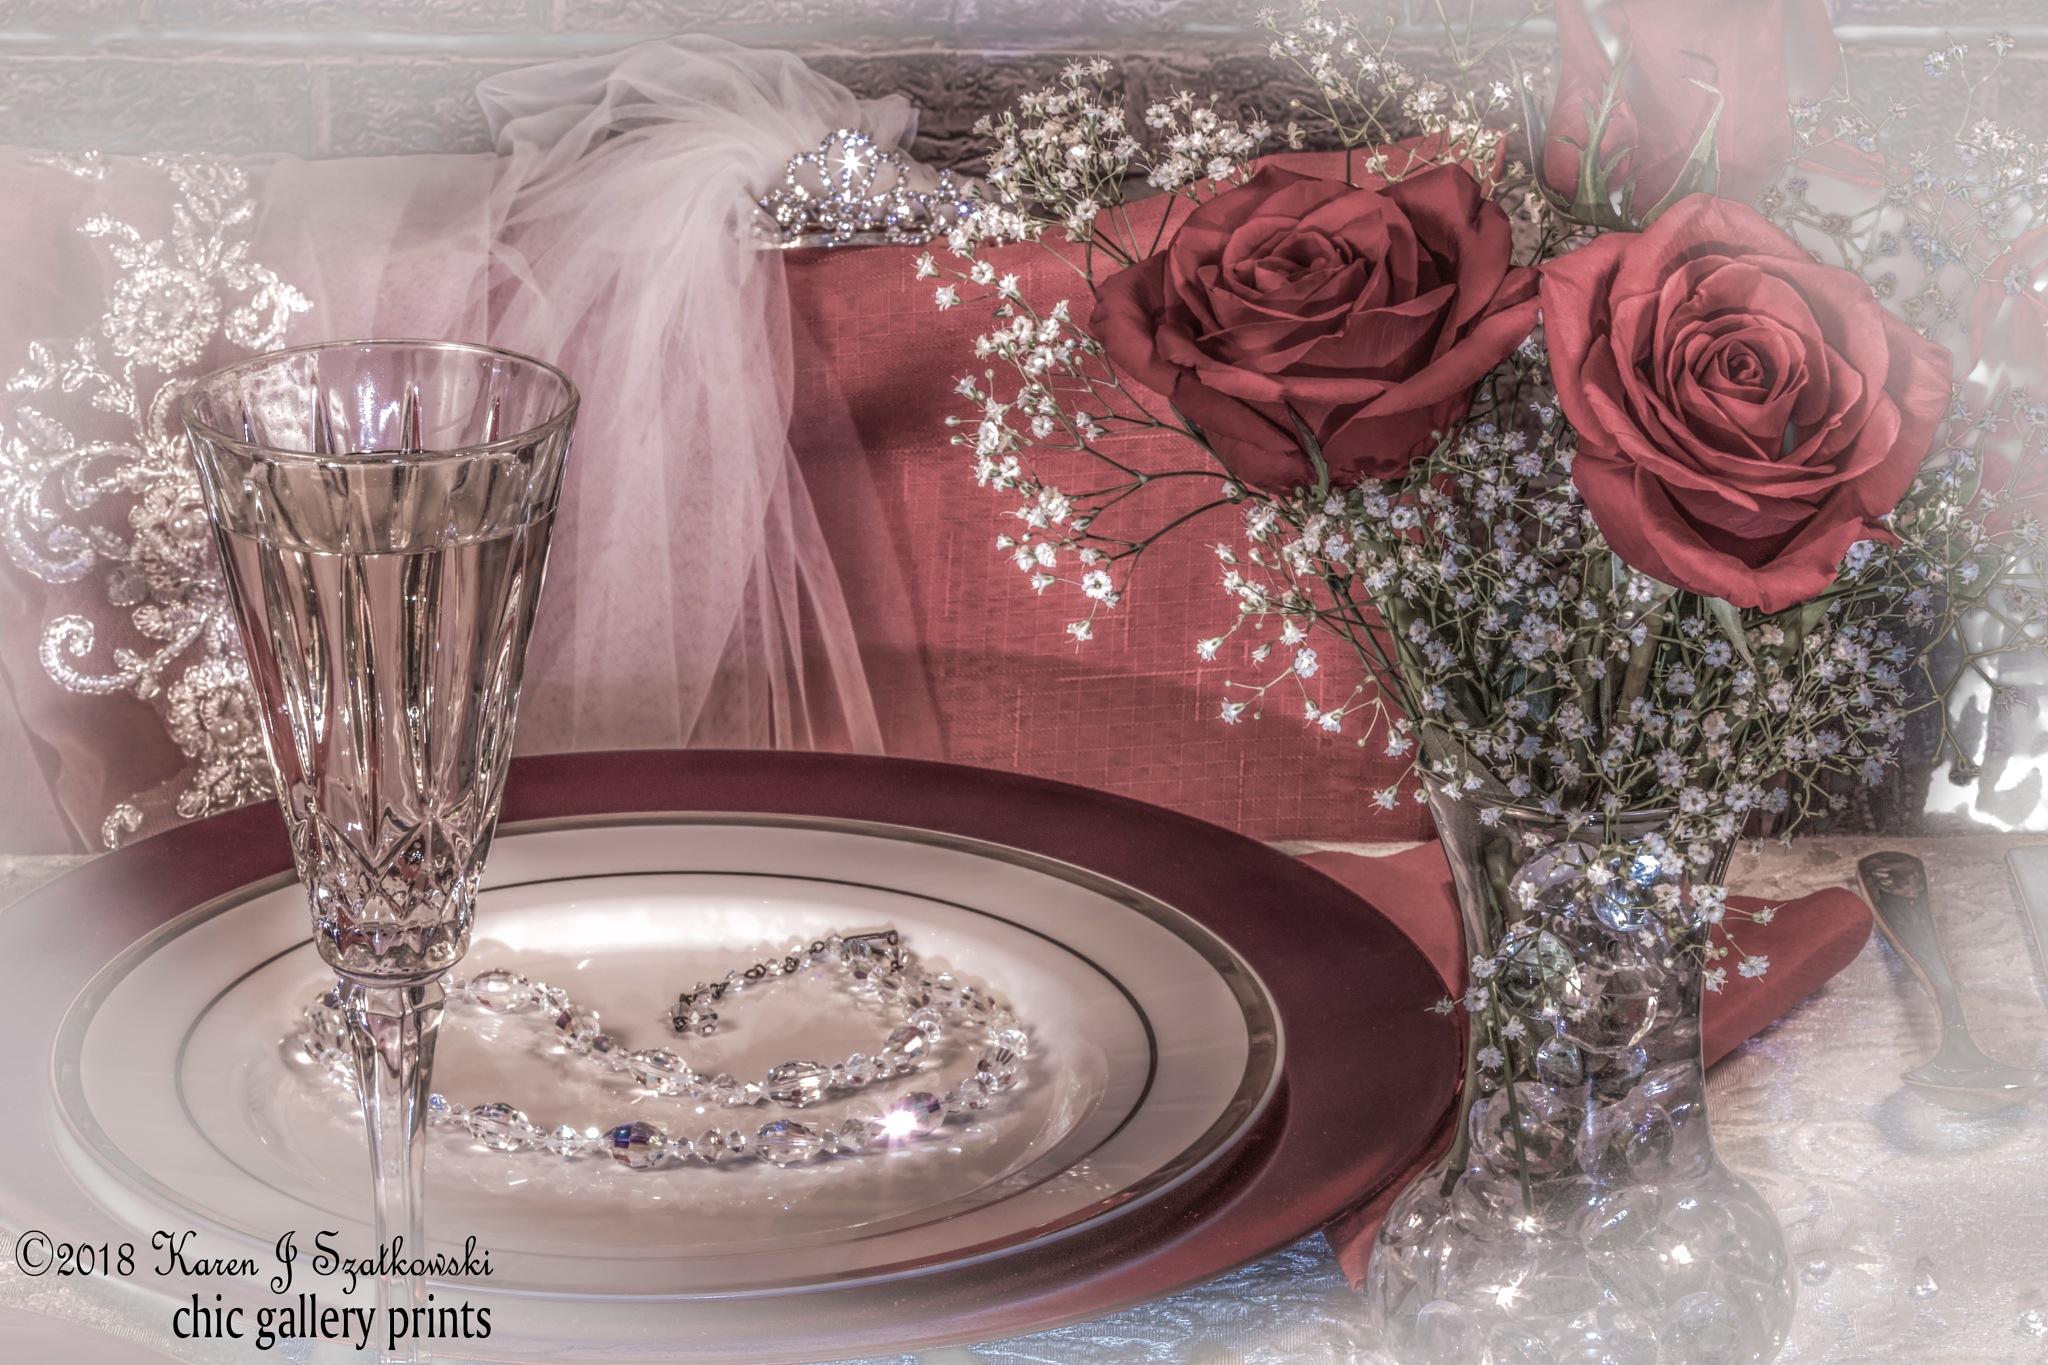 Wedding Shoot by Karen J. Garlock-Szatkowski